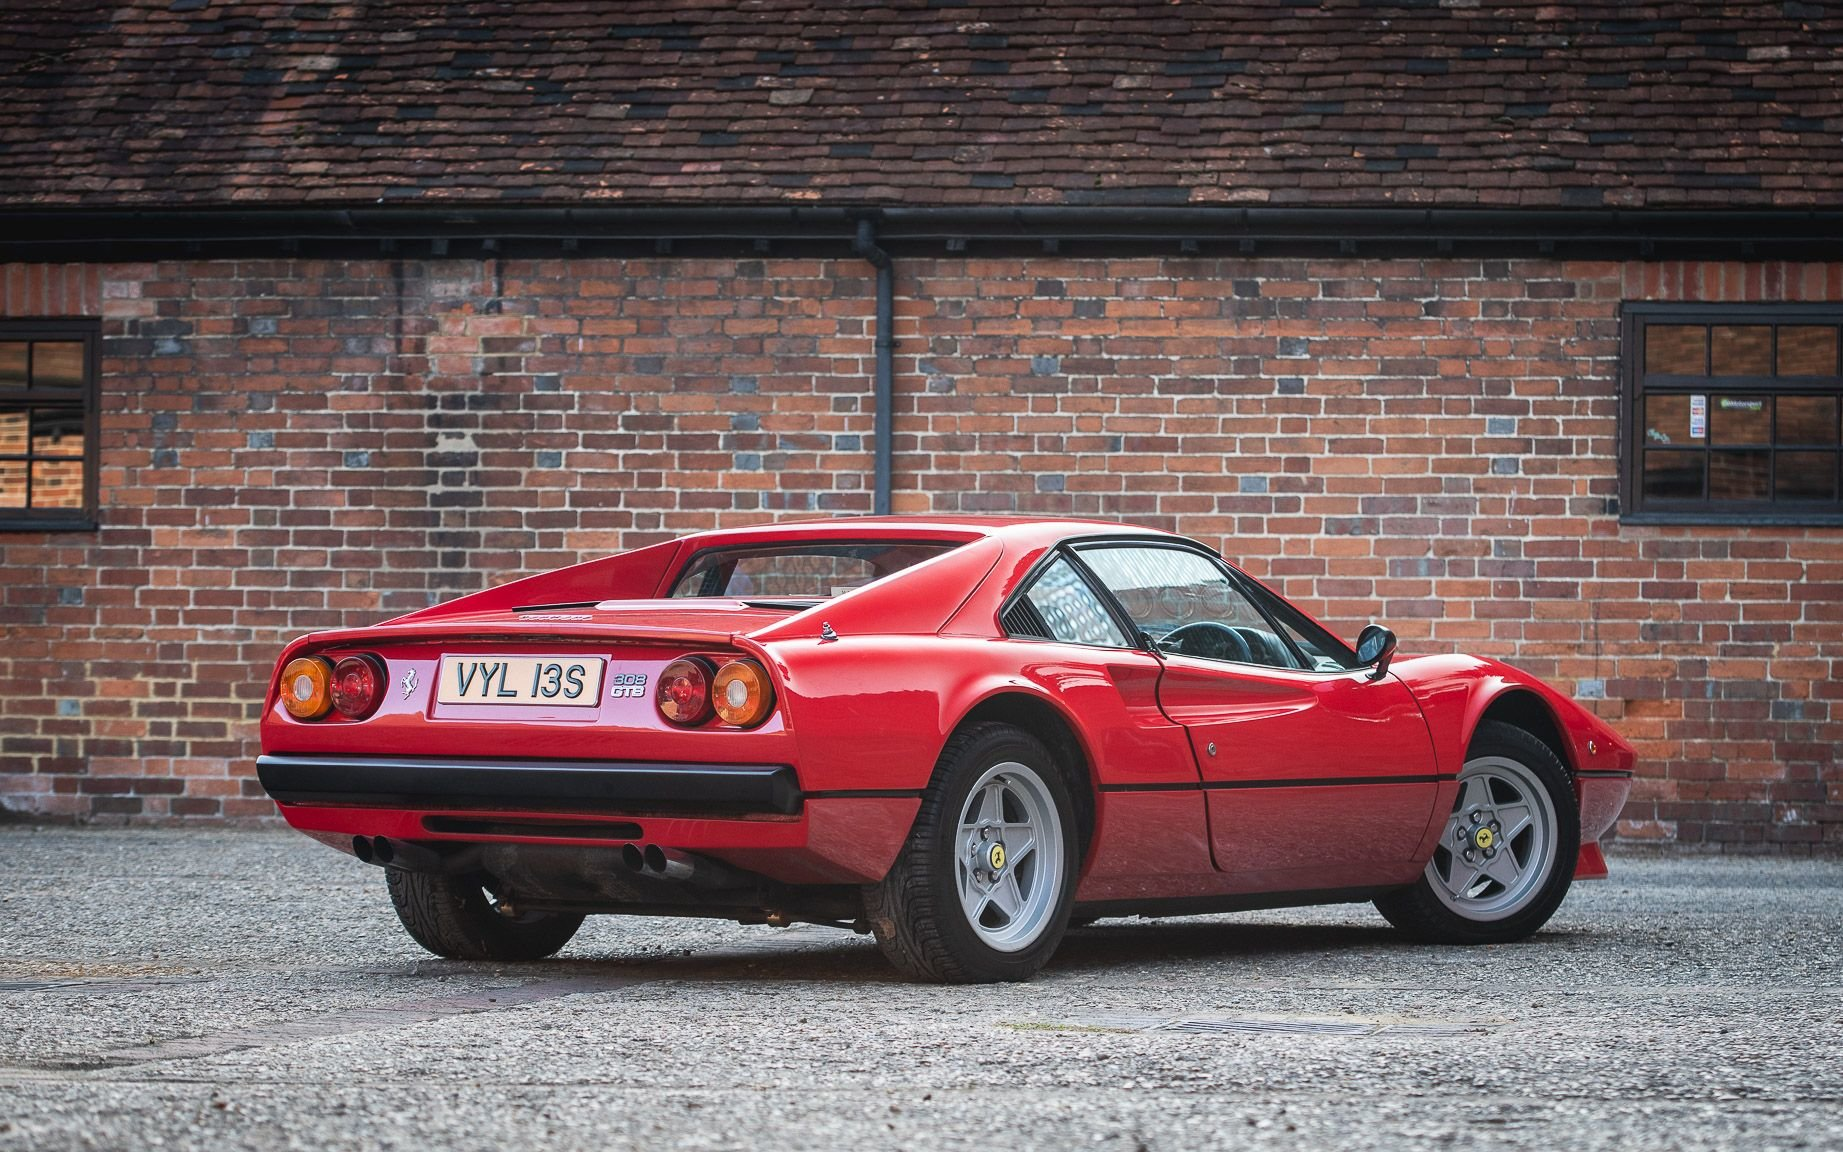 1978 Ferrari 308GTB 1979 3.0 Dry Sump For Sale (picture 5 of 18)